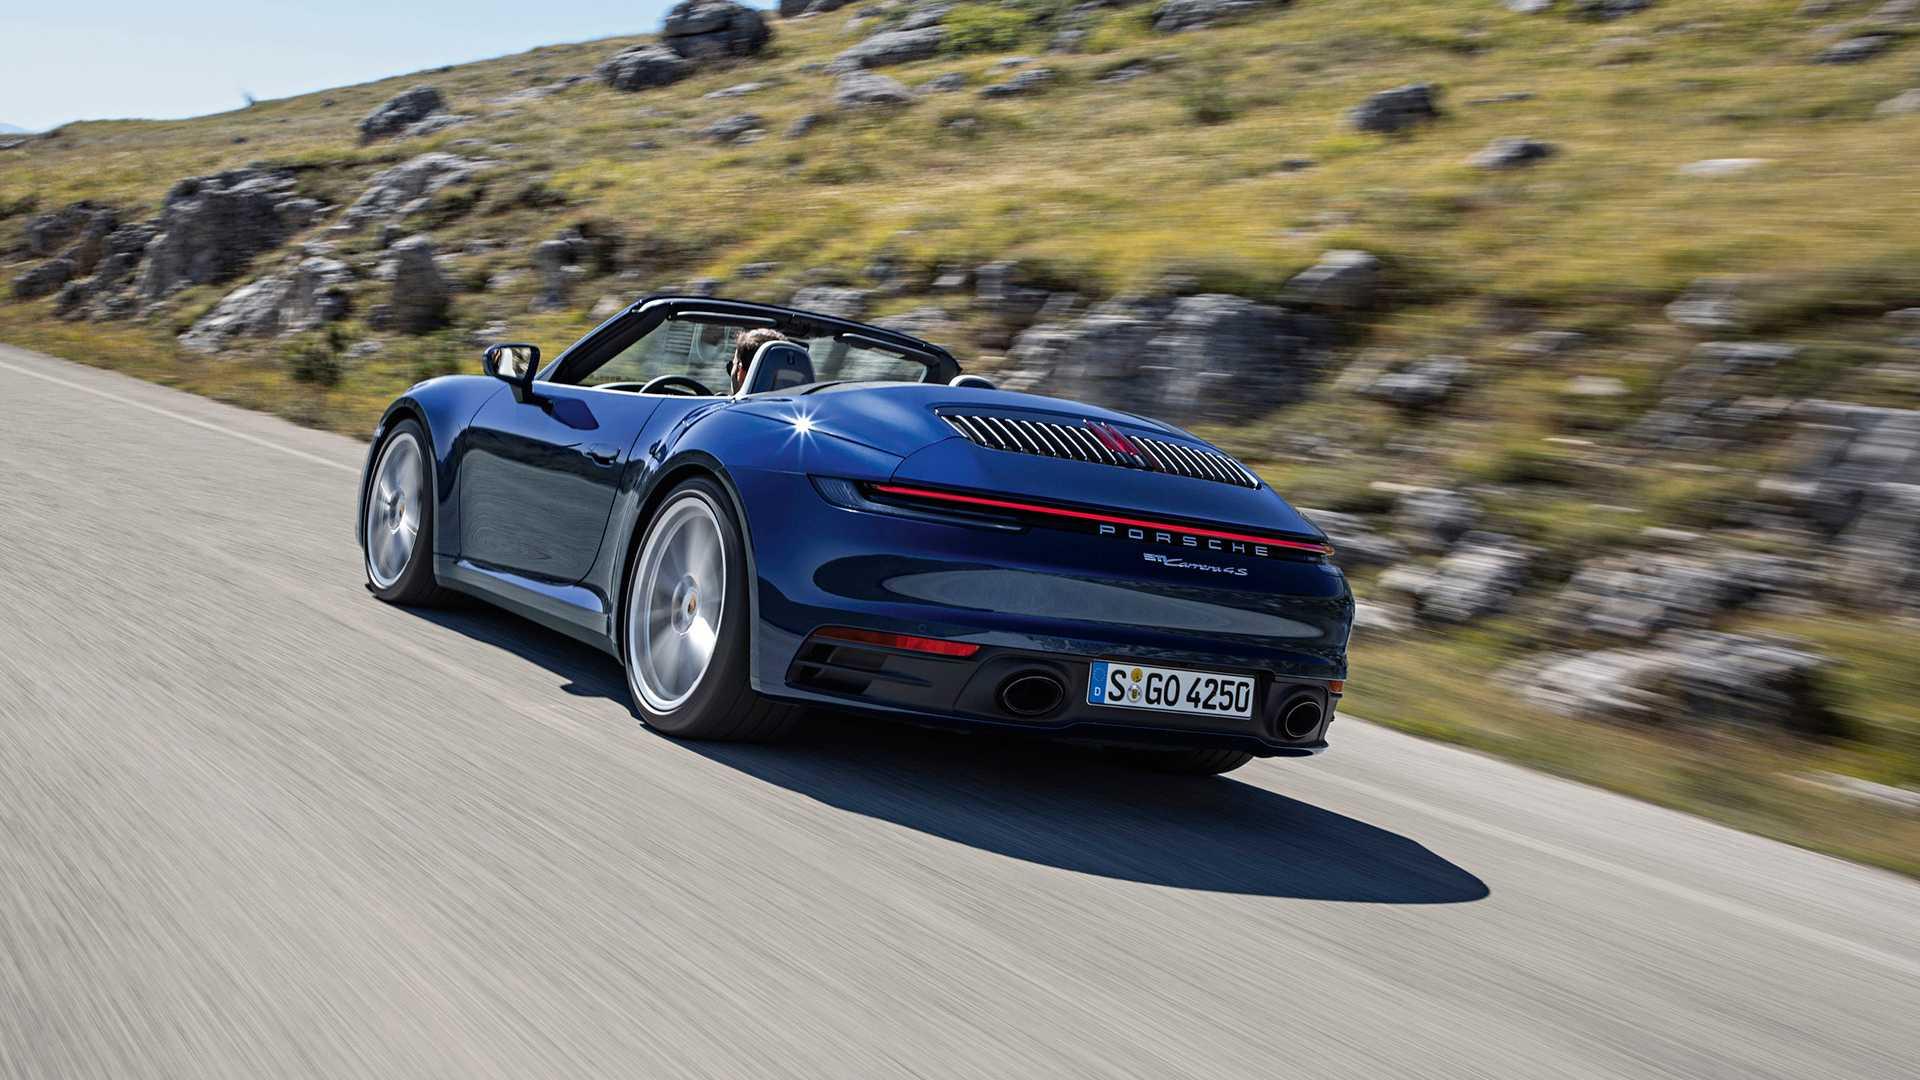 2020-porsche-911-cabriolet-trinh-lang-8.jpg